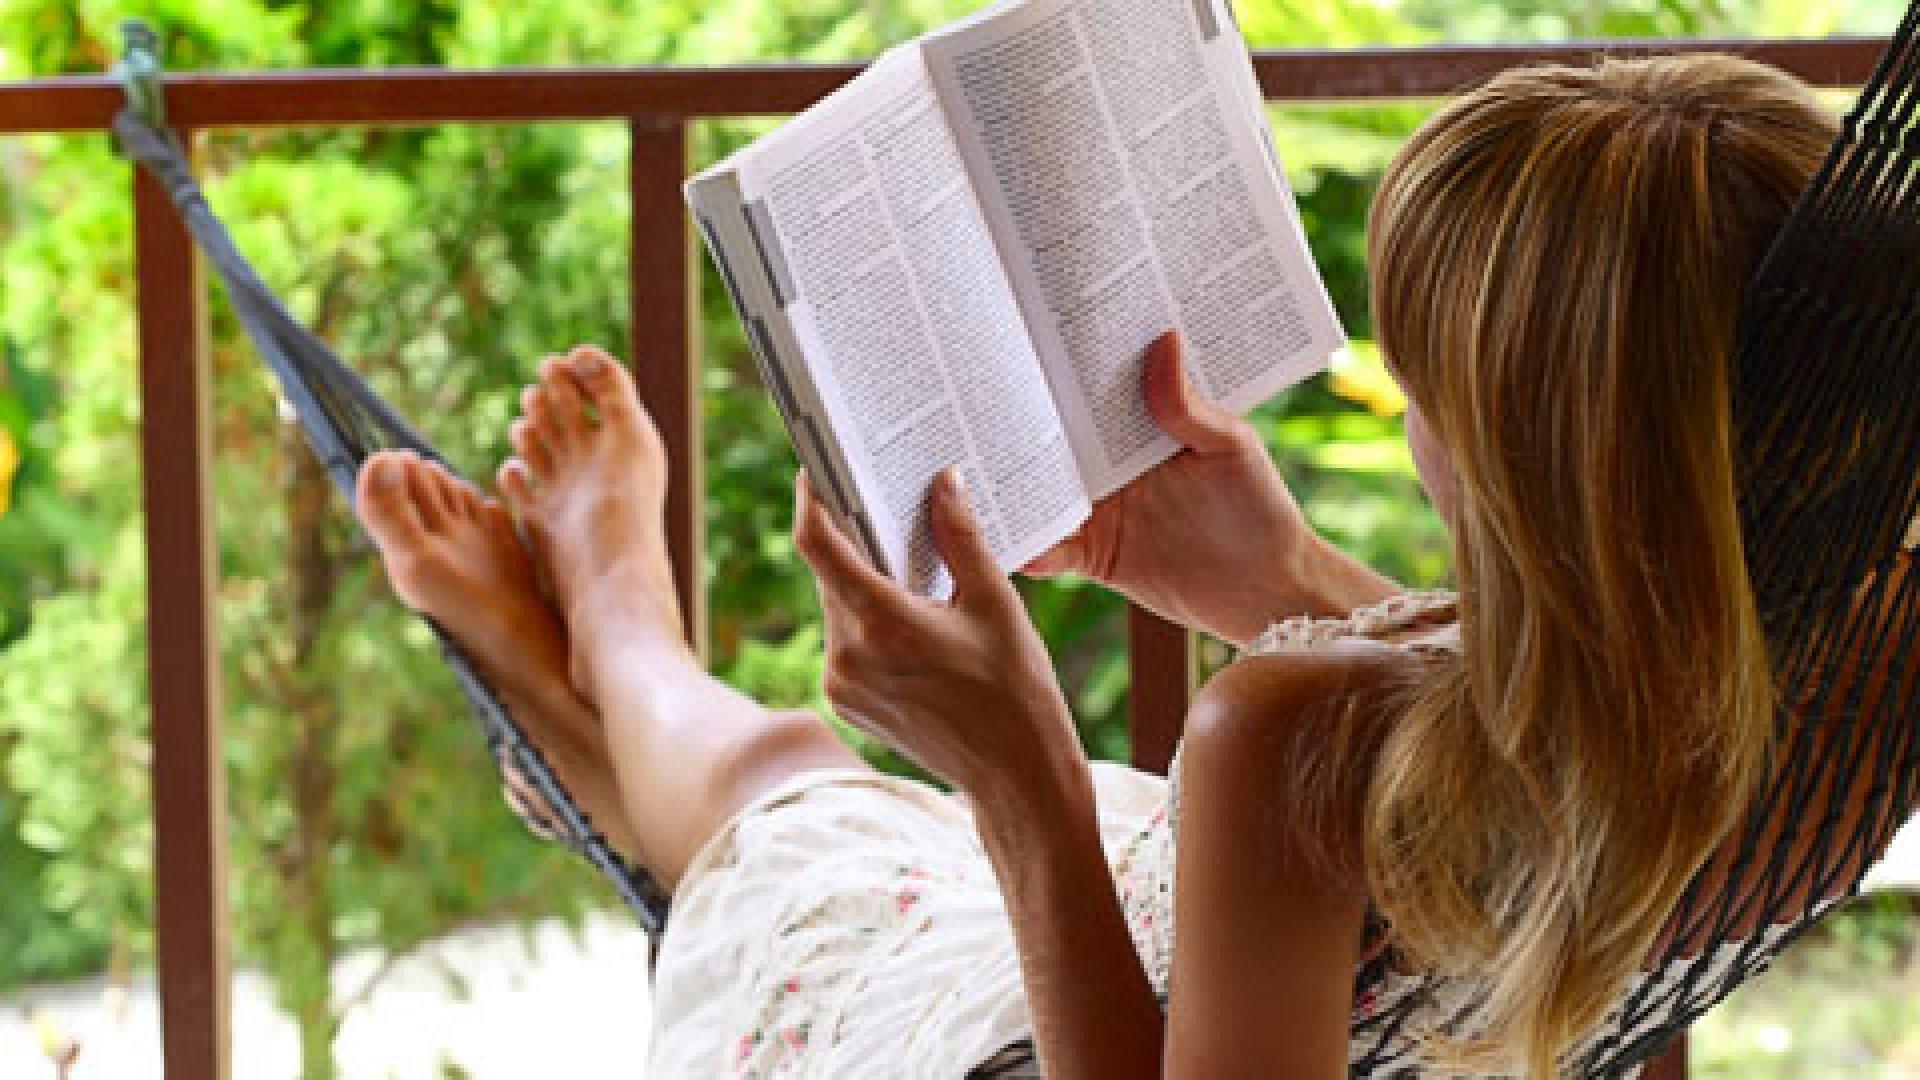 Goodreads Hits 10 Million Members